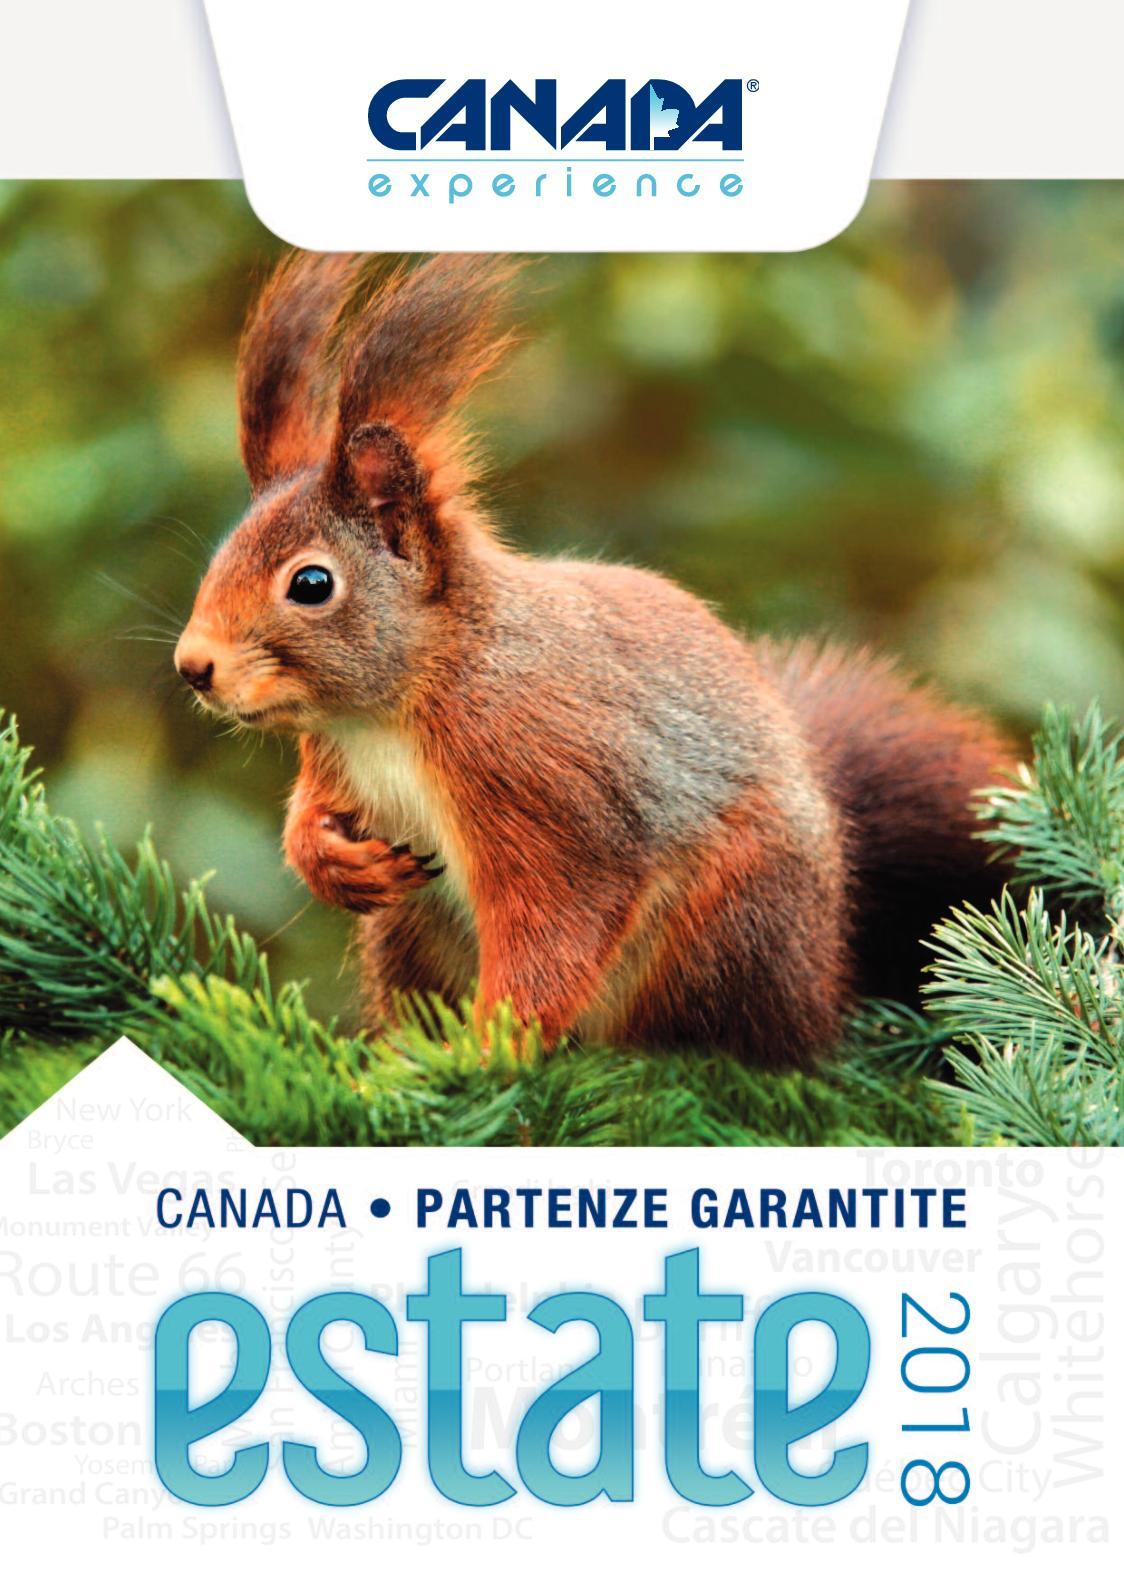 Canada Experience® Partenze Garantite 2018